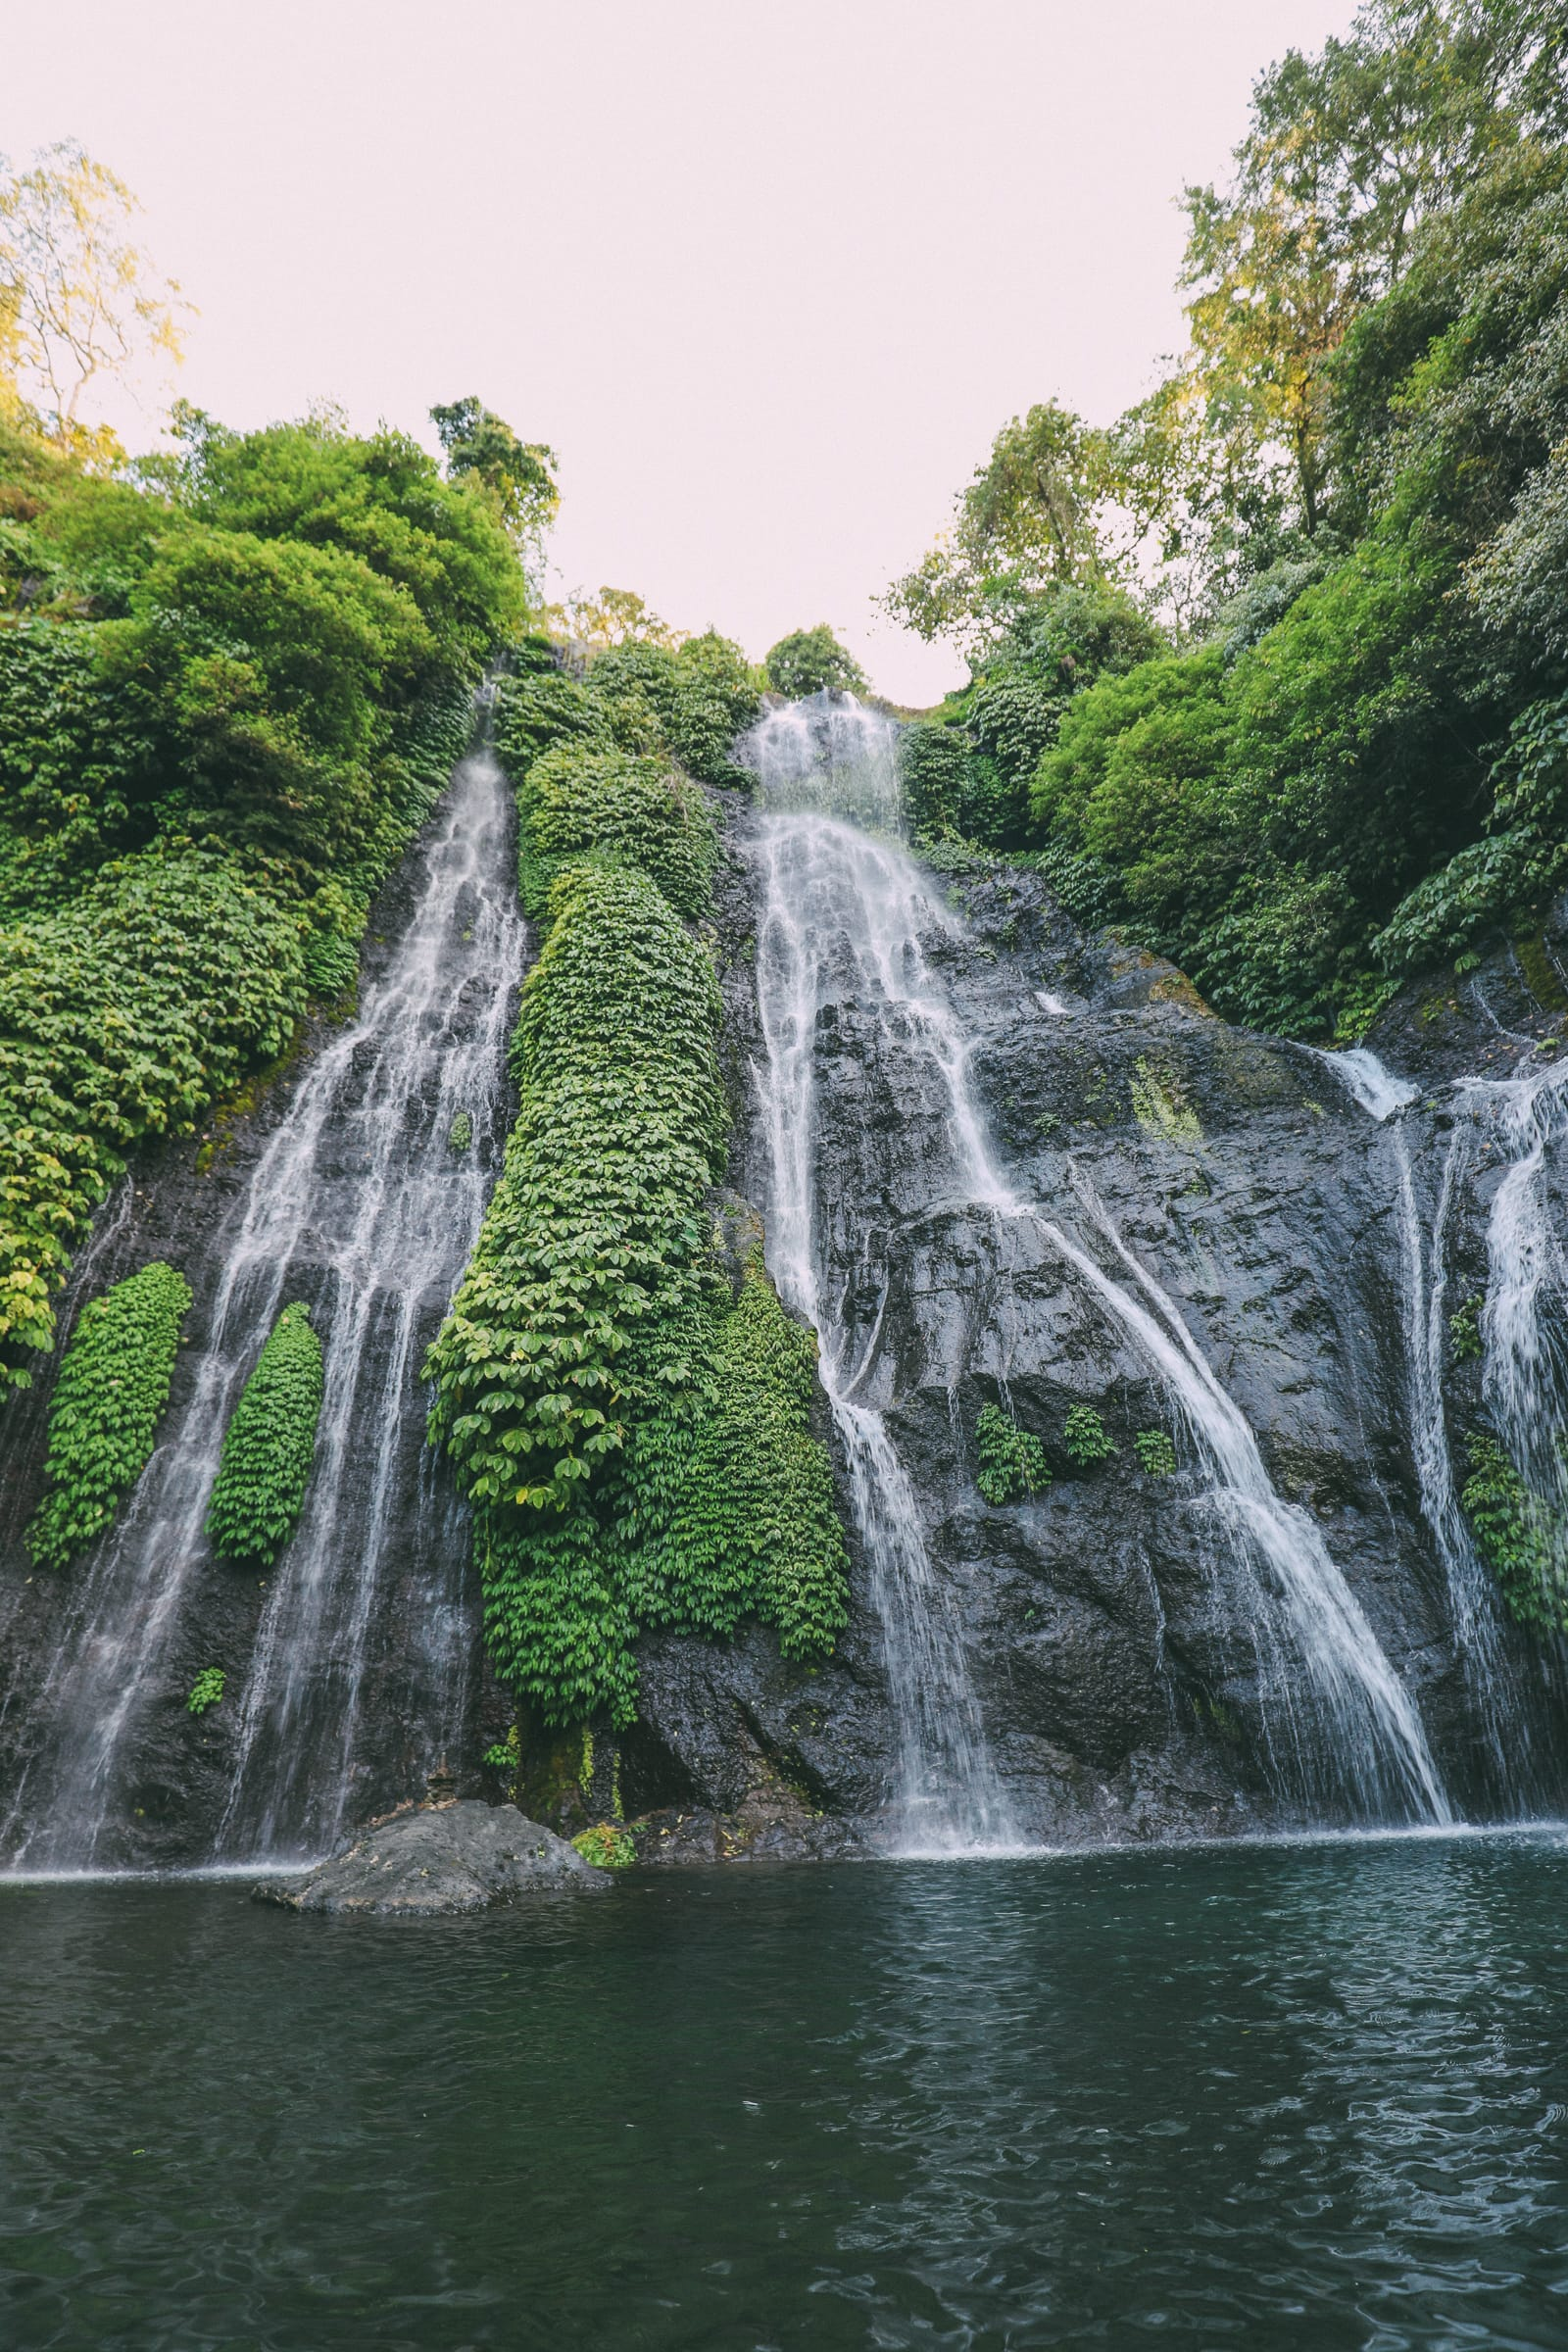 The Amazing Banyumala Twin Waterfalls In The Jungles Of Bali (14)